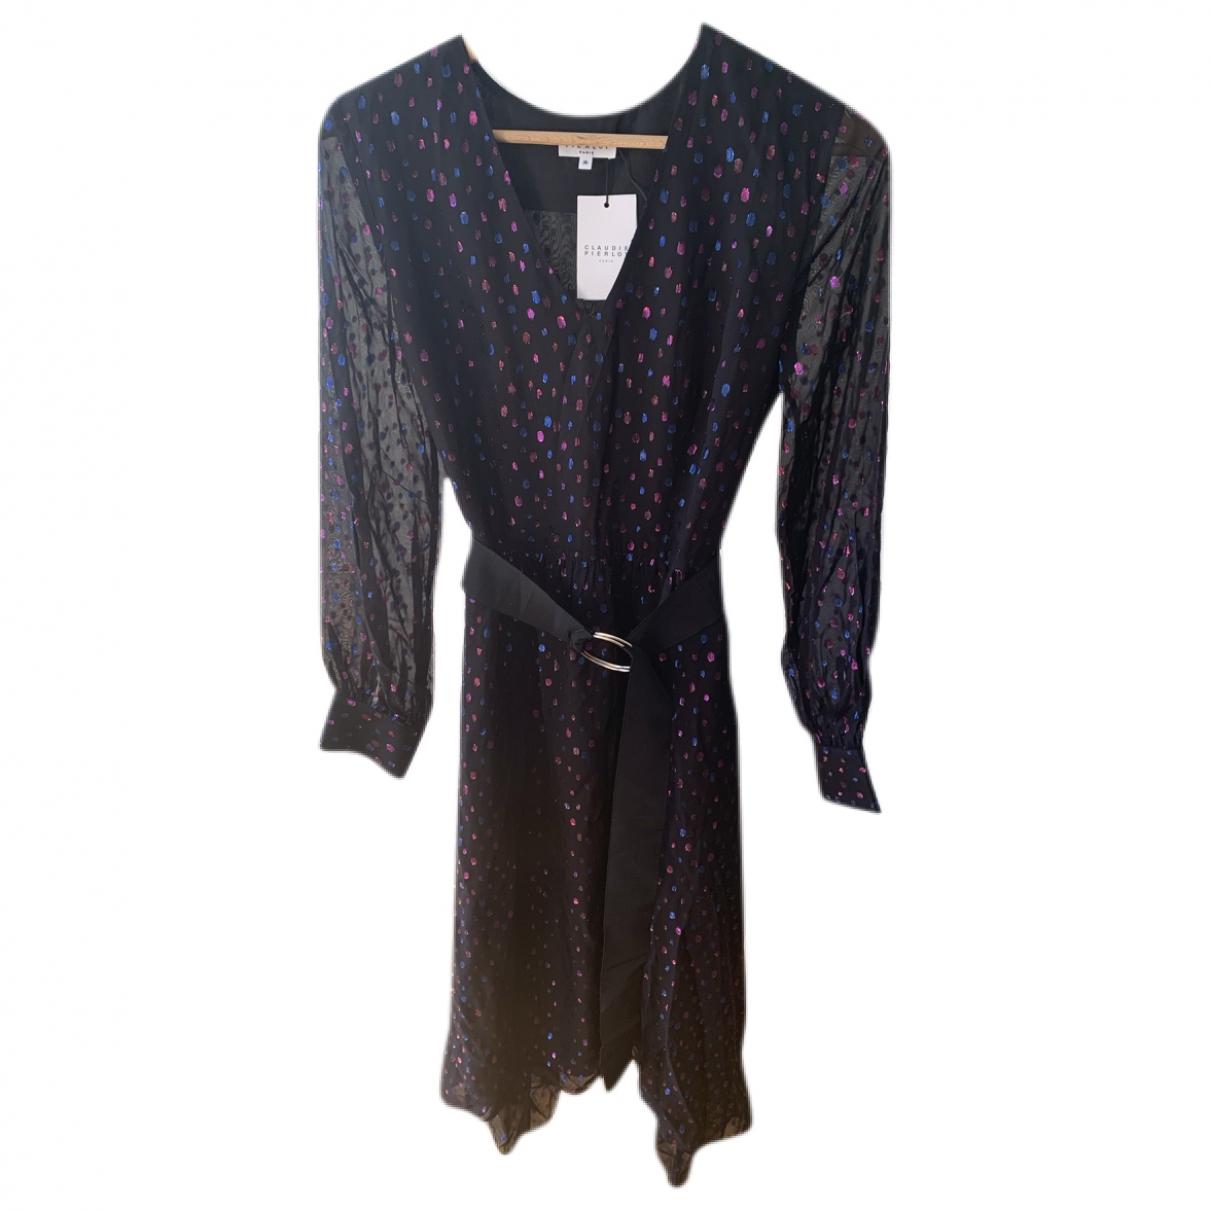 Claudie Pierlot Spring Summer 2020 Black dress for Women 36 FR